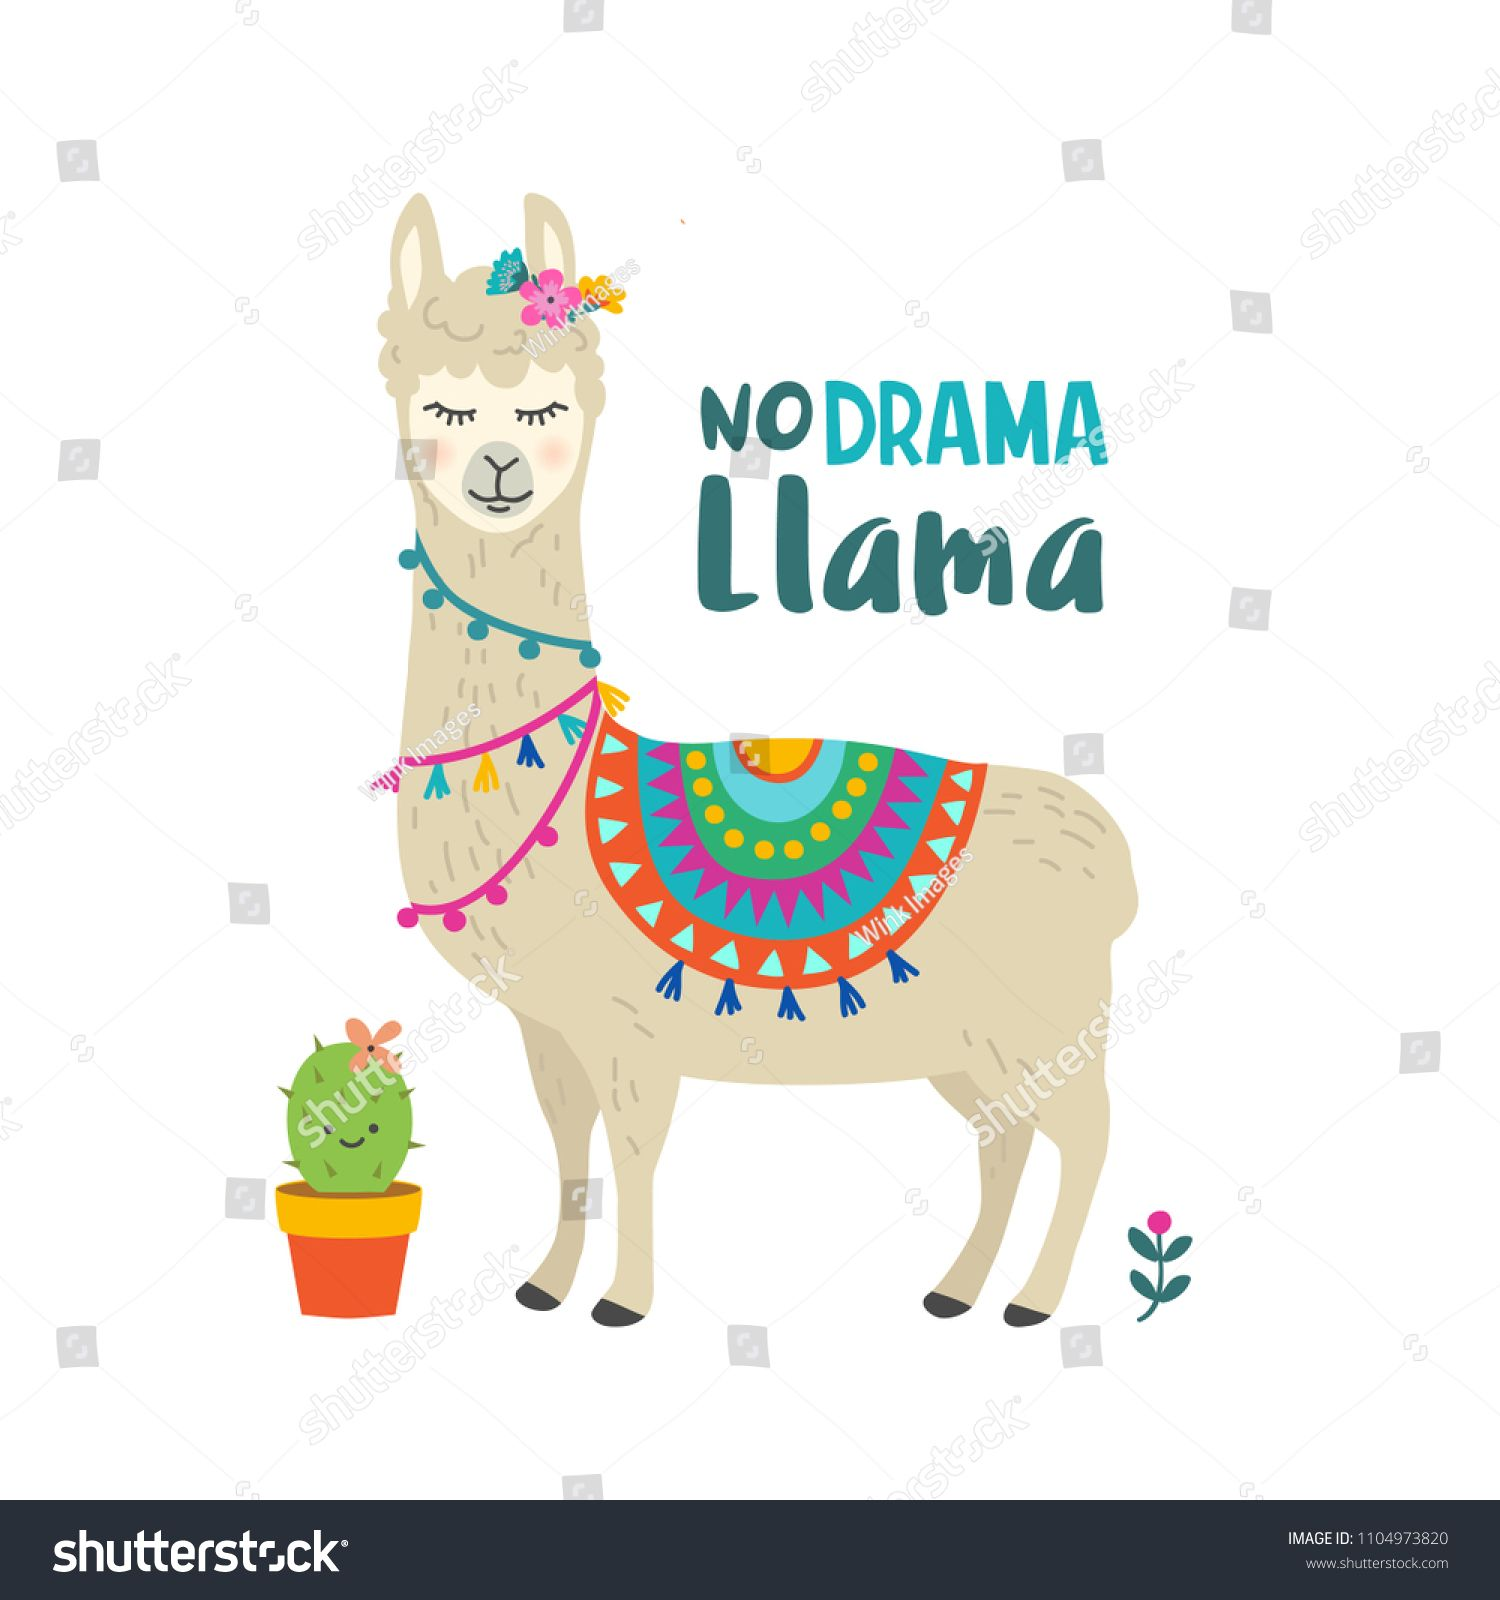 Cute cartoon llama vector design with No drama llama